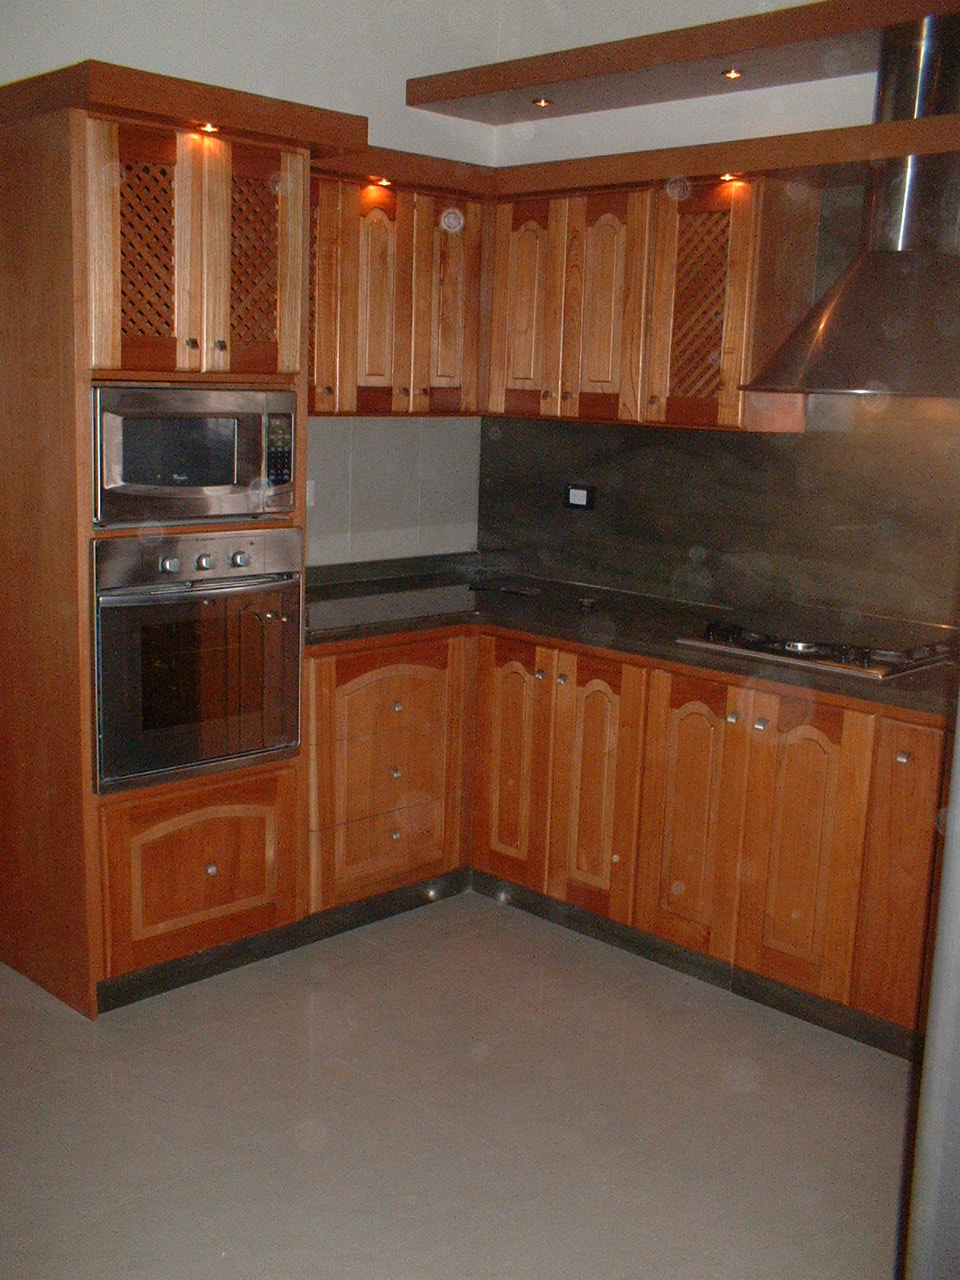 Cocinas de madera de cedro imagui for Muebles cocina madera